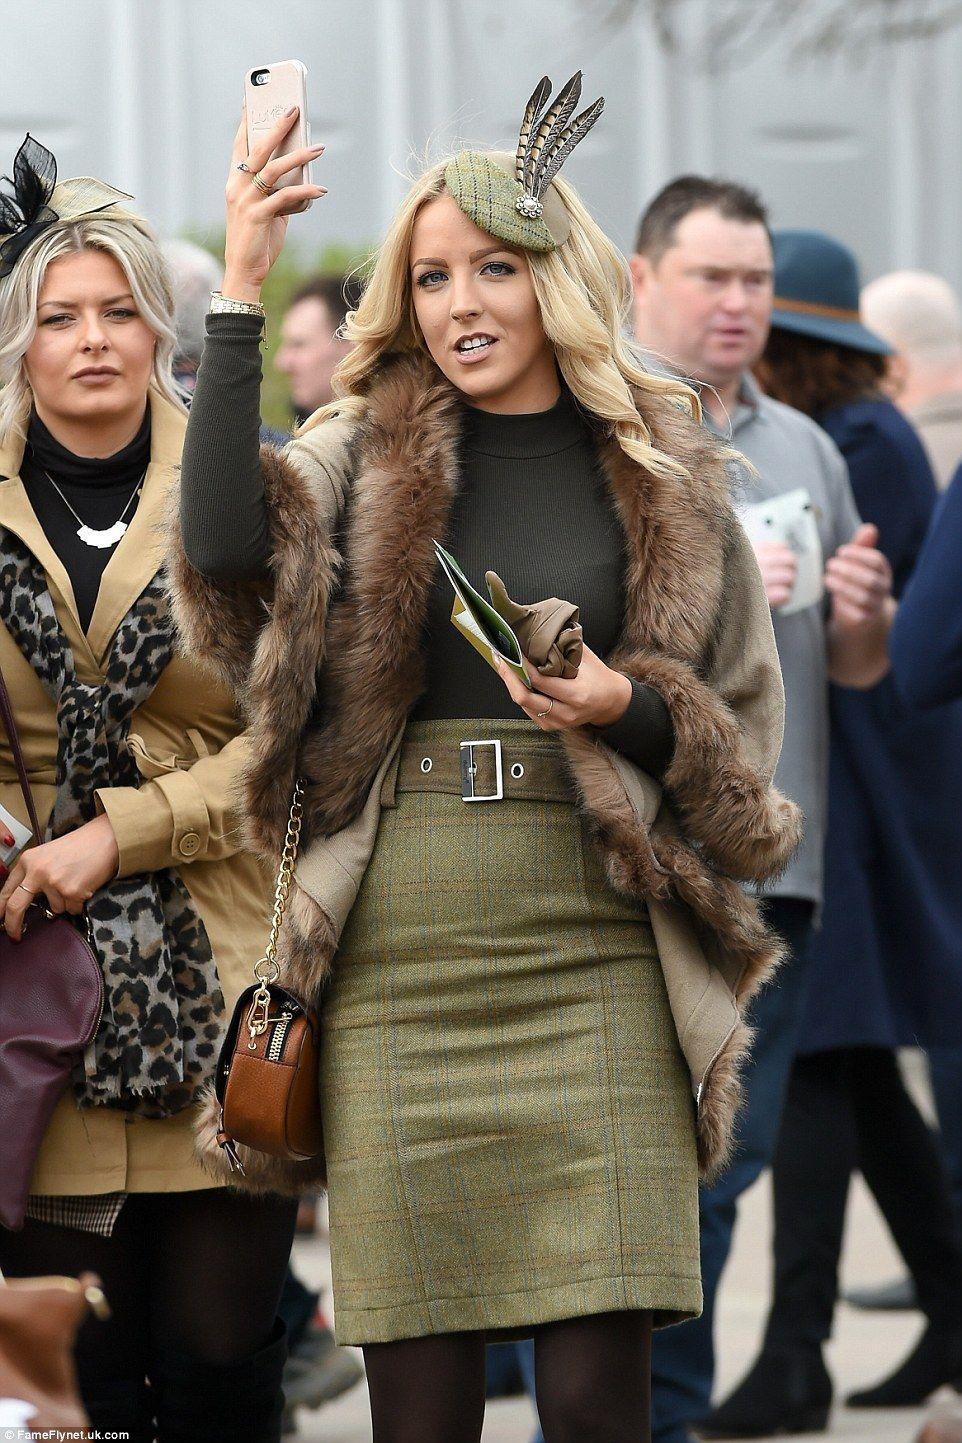 Glamorous racegoers arrive for the first day at cheltenham